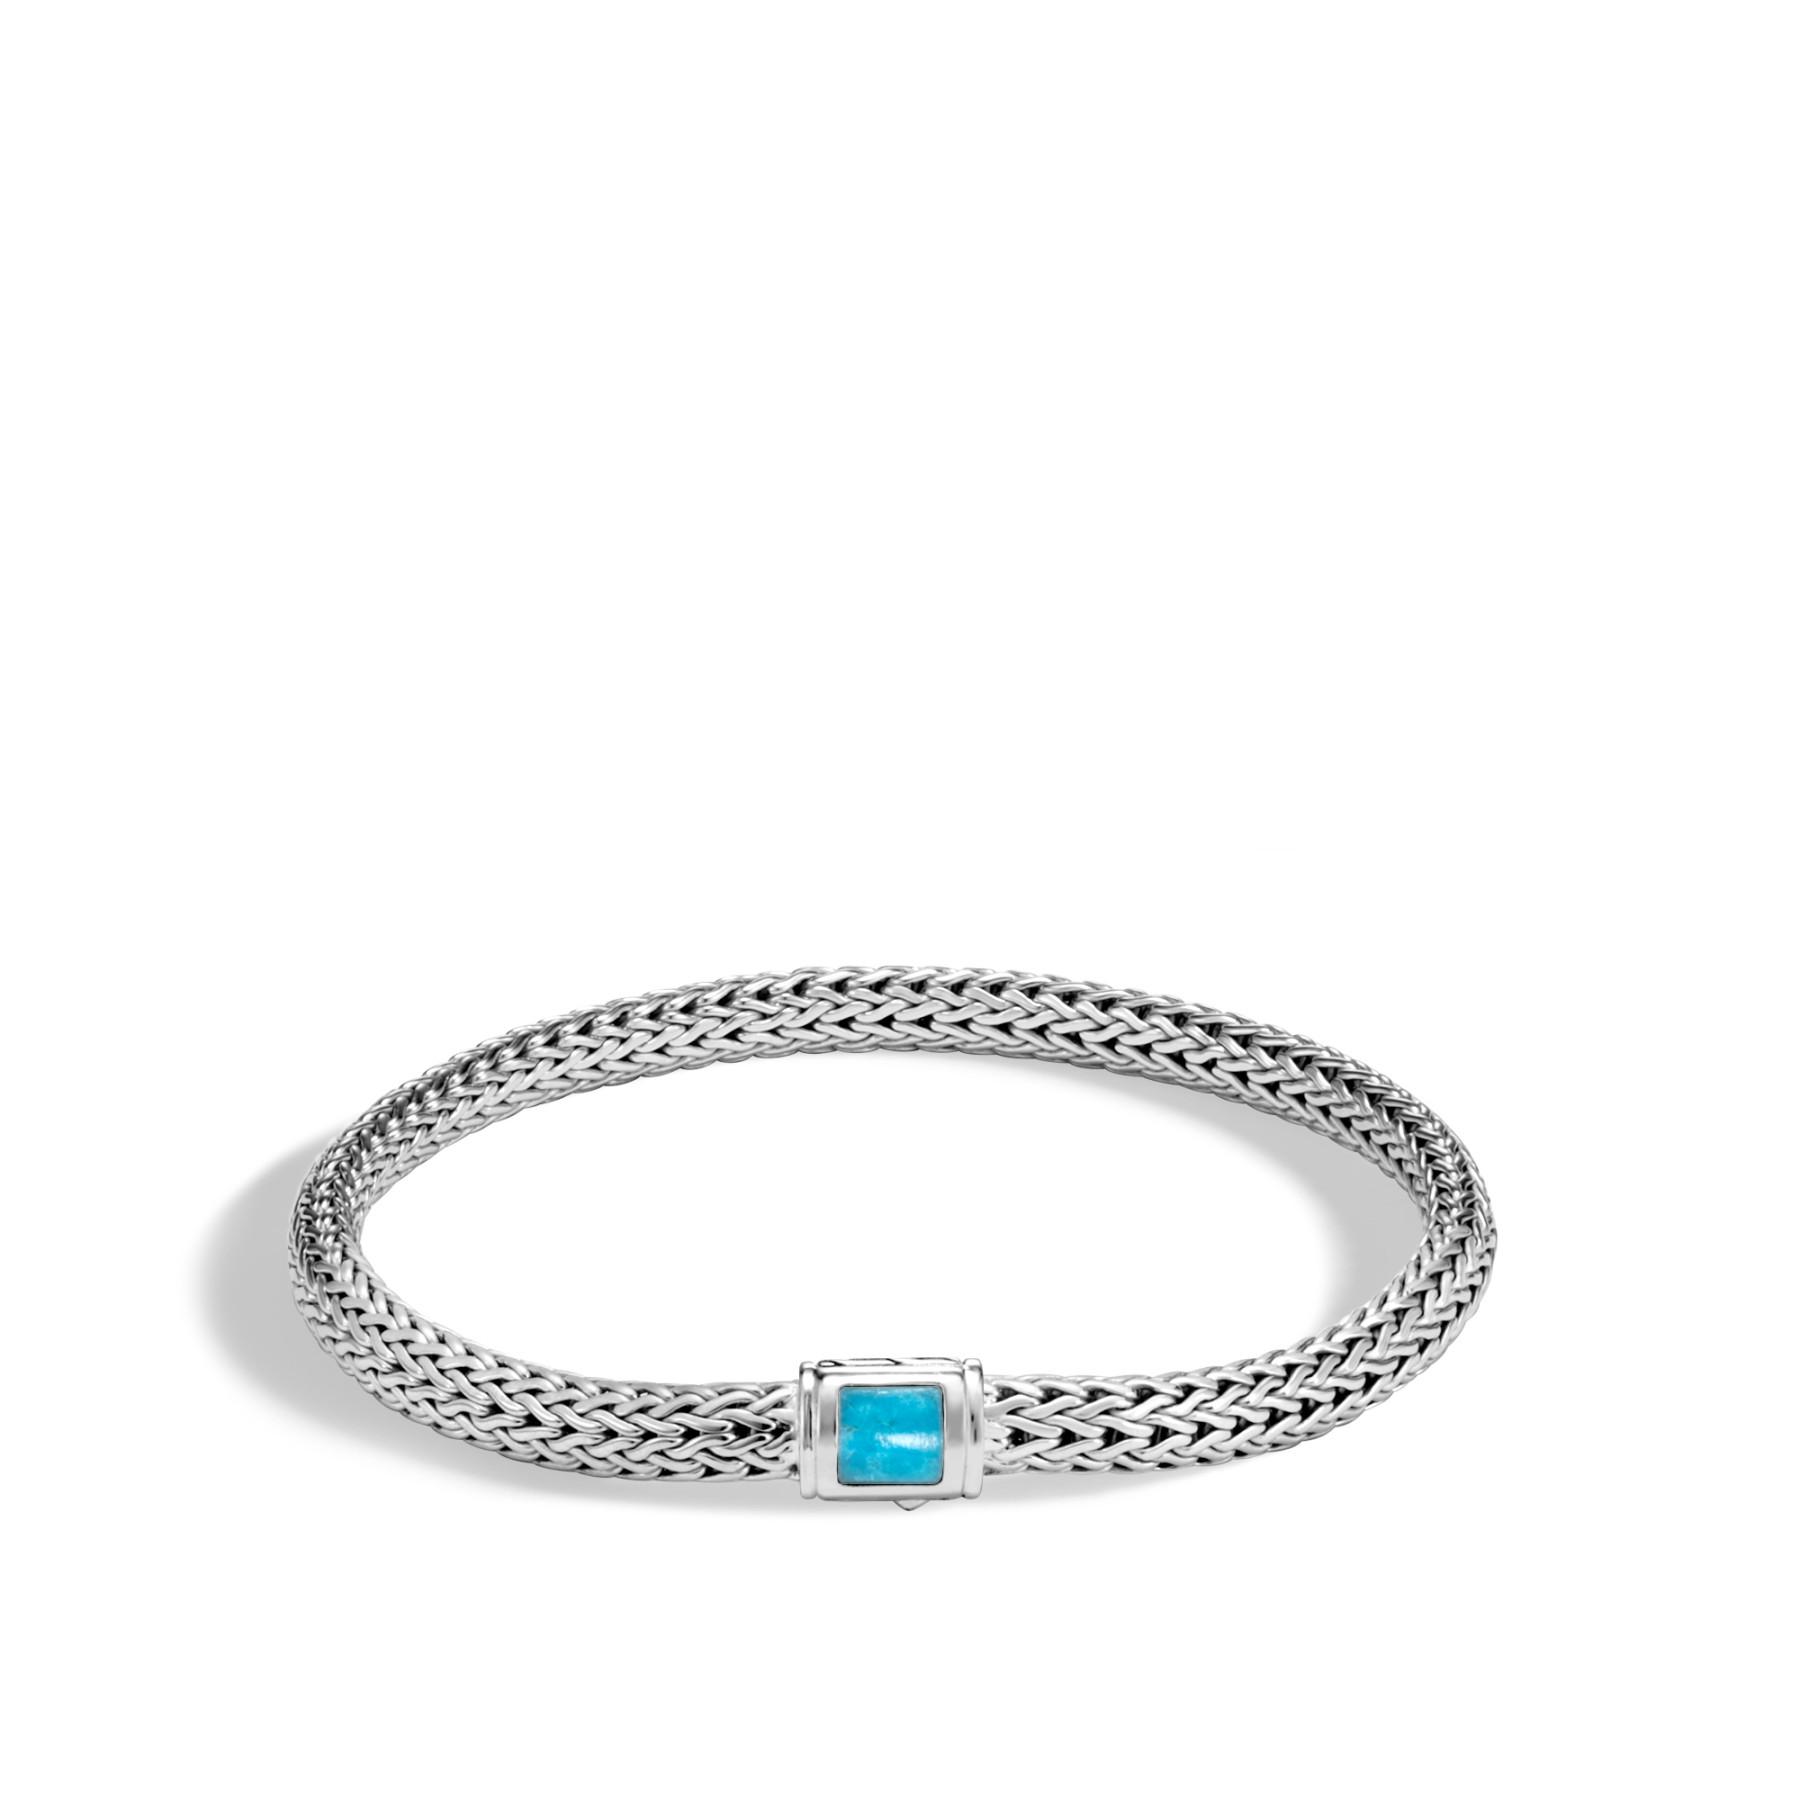 John Hardy Extra Large Classic Chain 5mm Turquoise Bracelet